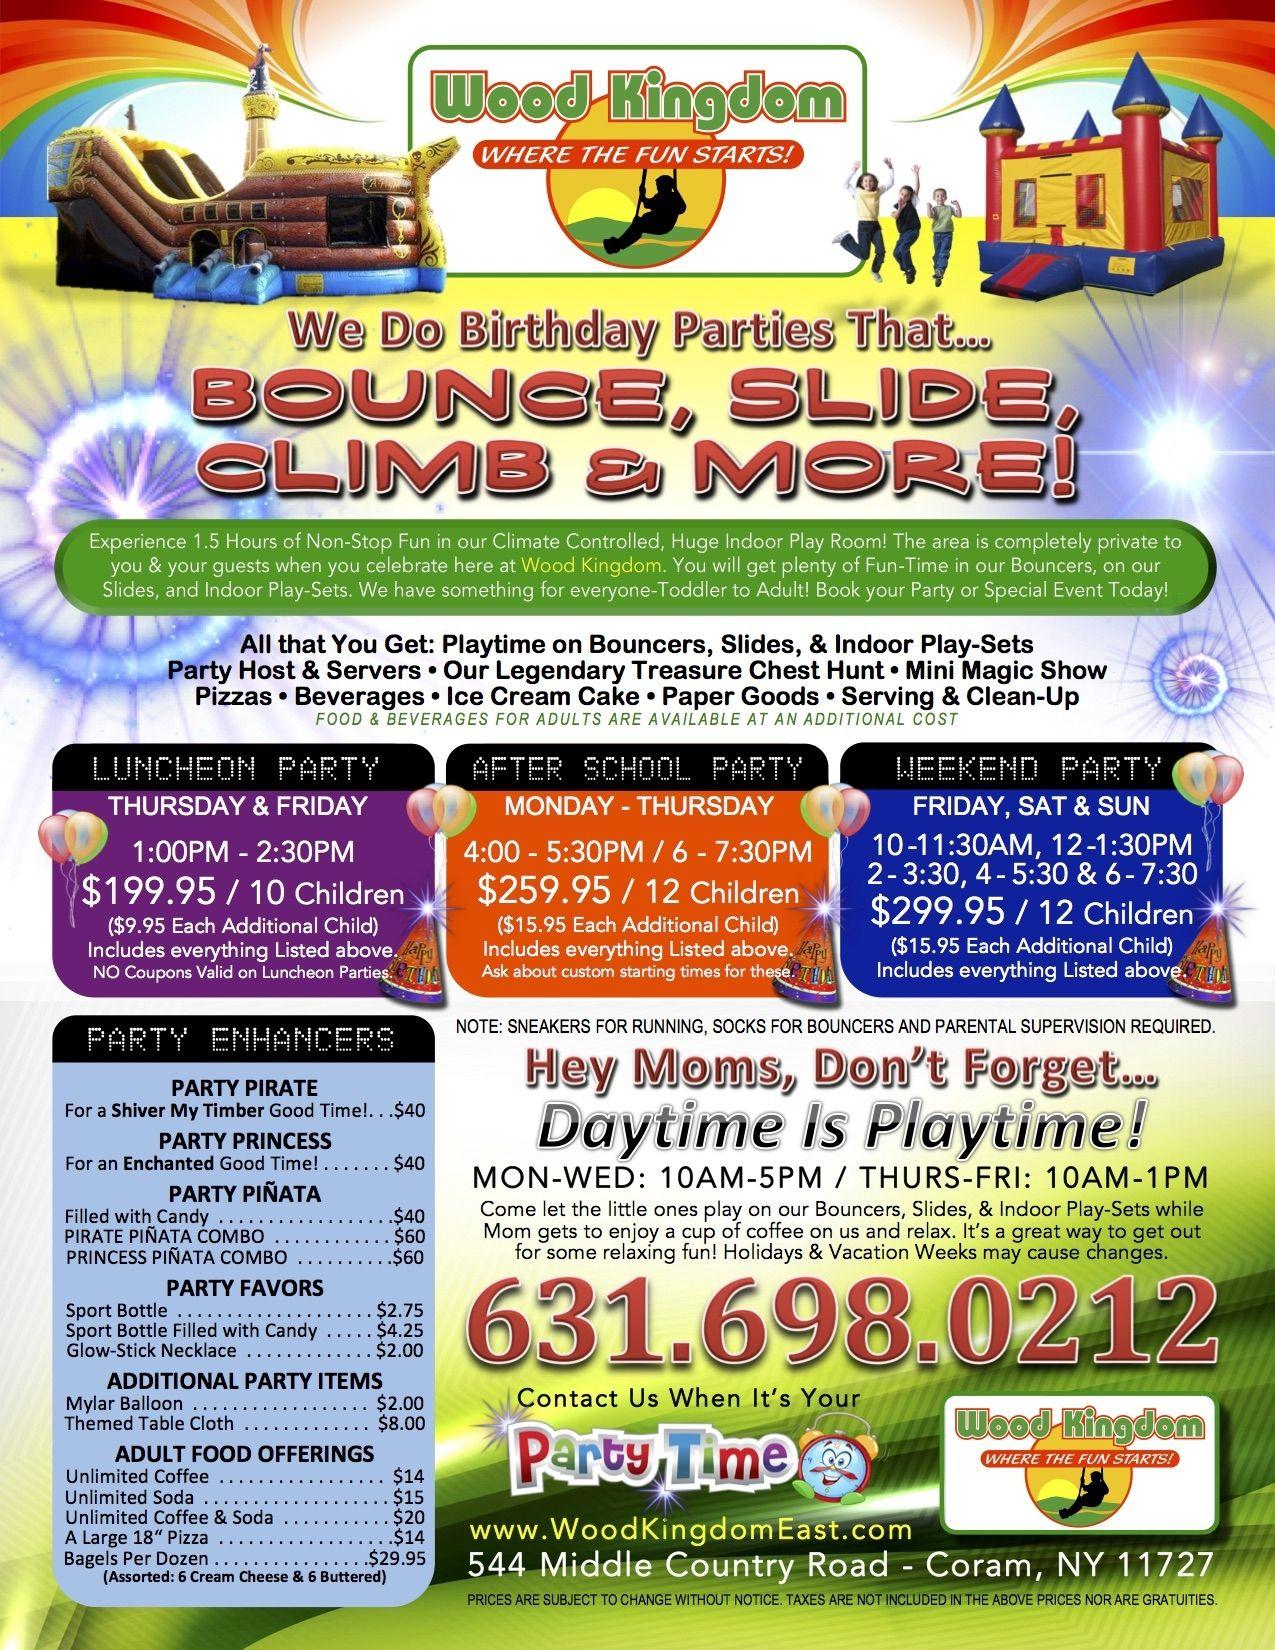 Birthday Parties At Wood Kingdom East